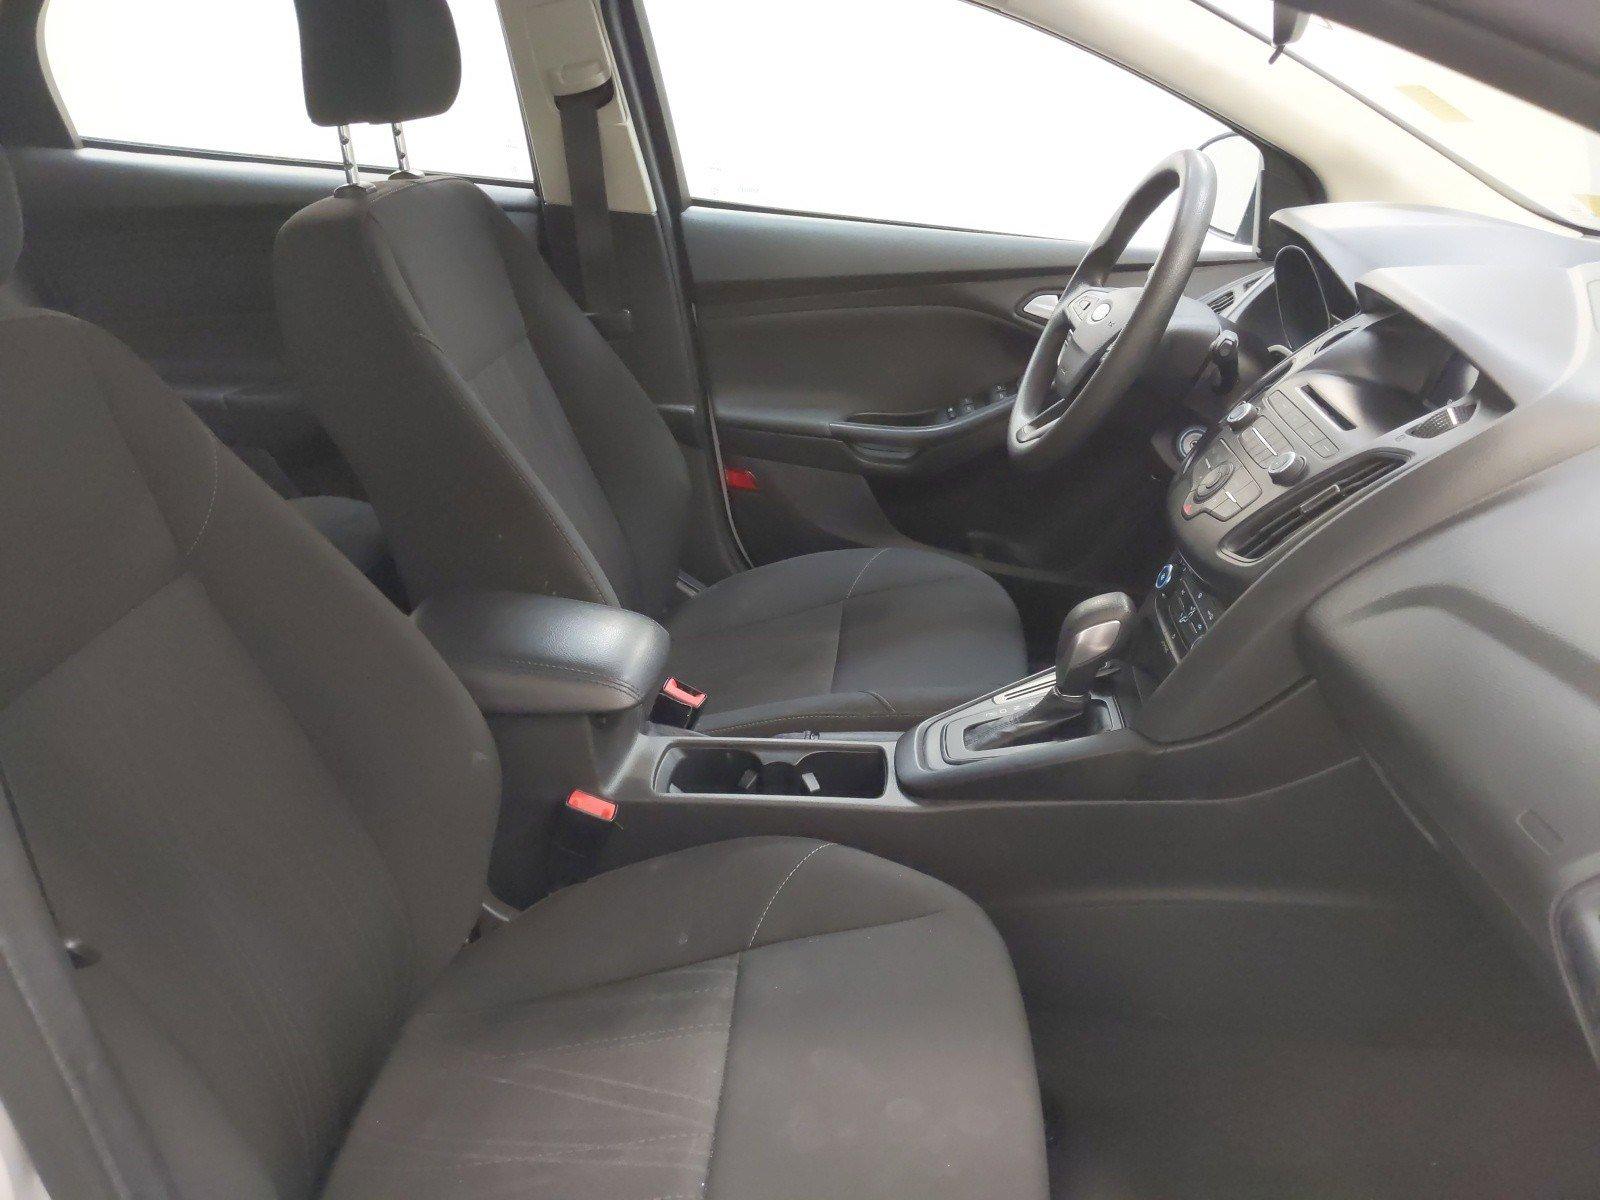 Used 2017 Ford Focus SE 4D Hatchback for sale in Grand Island NE